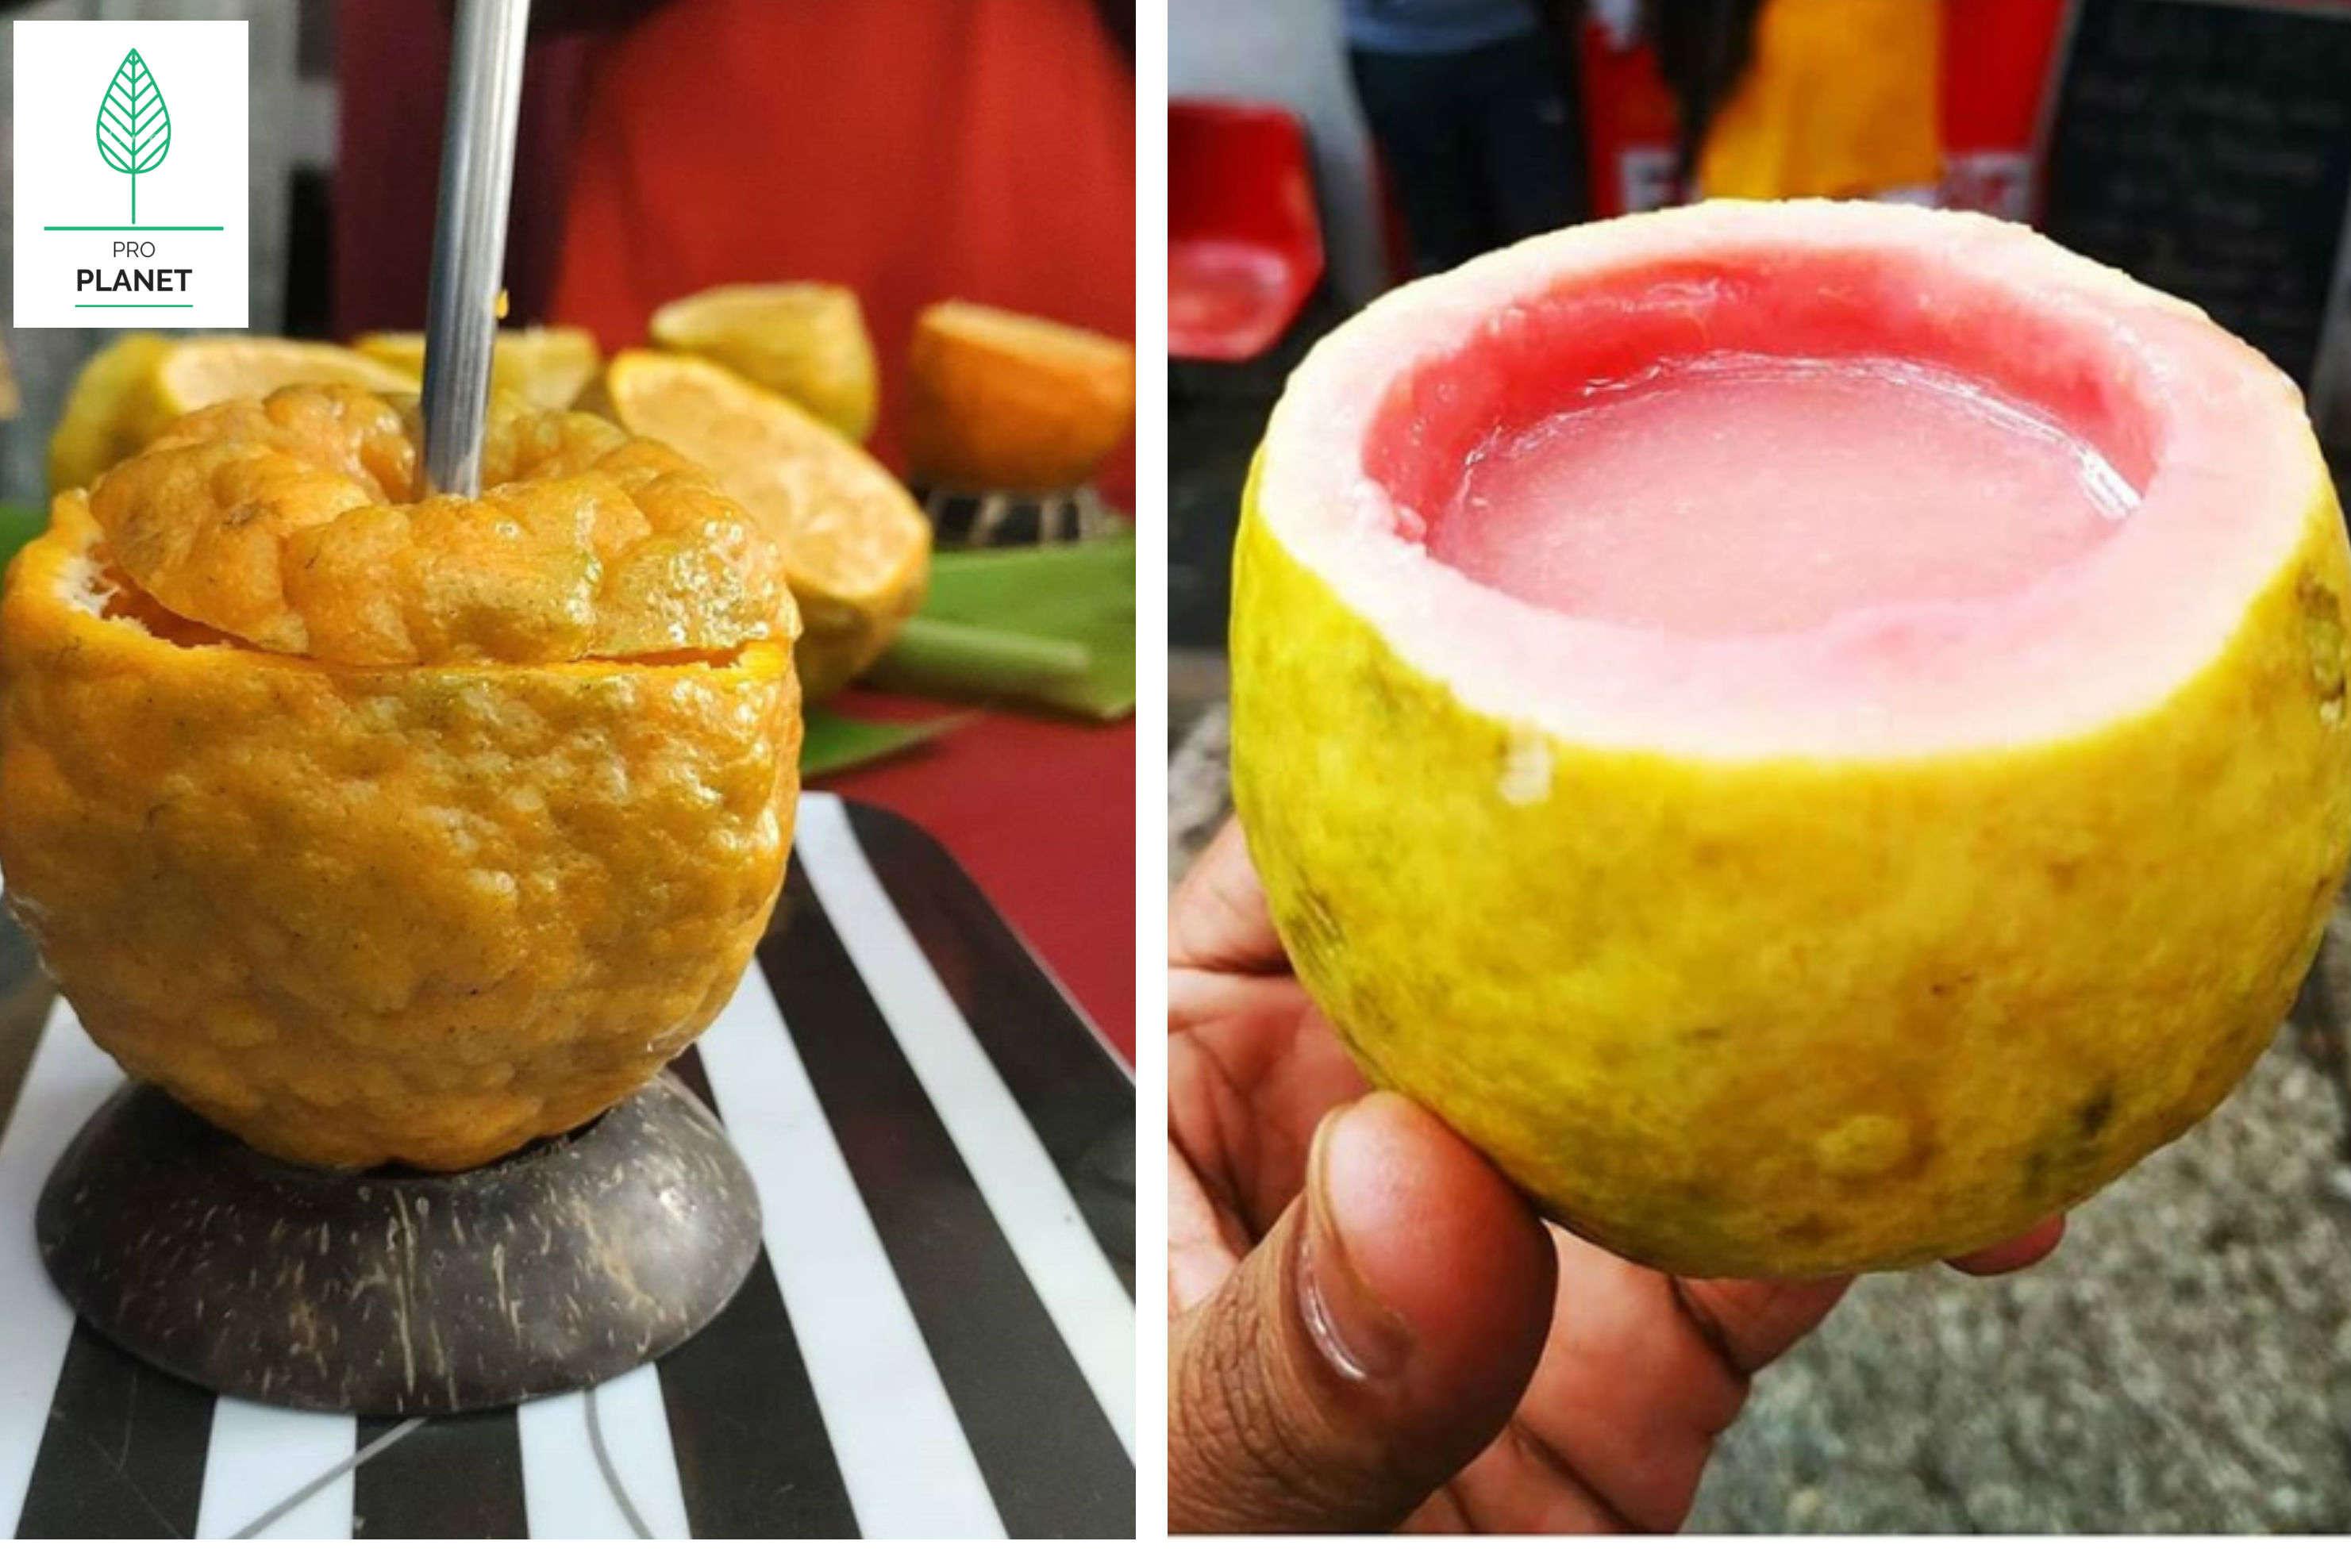 This zero-waste juice bar in Bengaluru serves juice in fruit shells